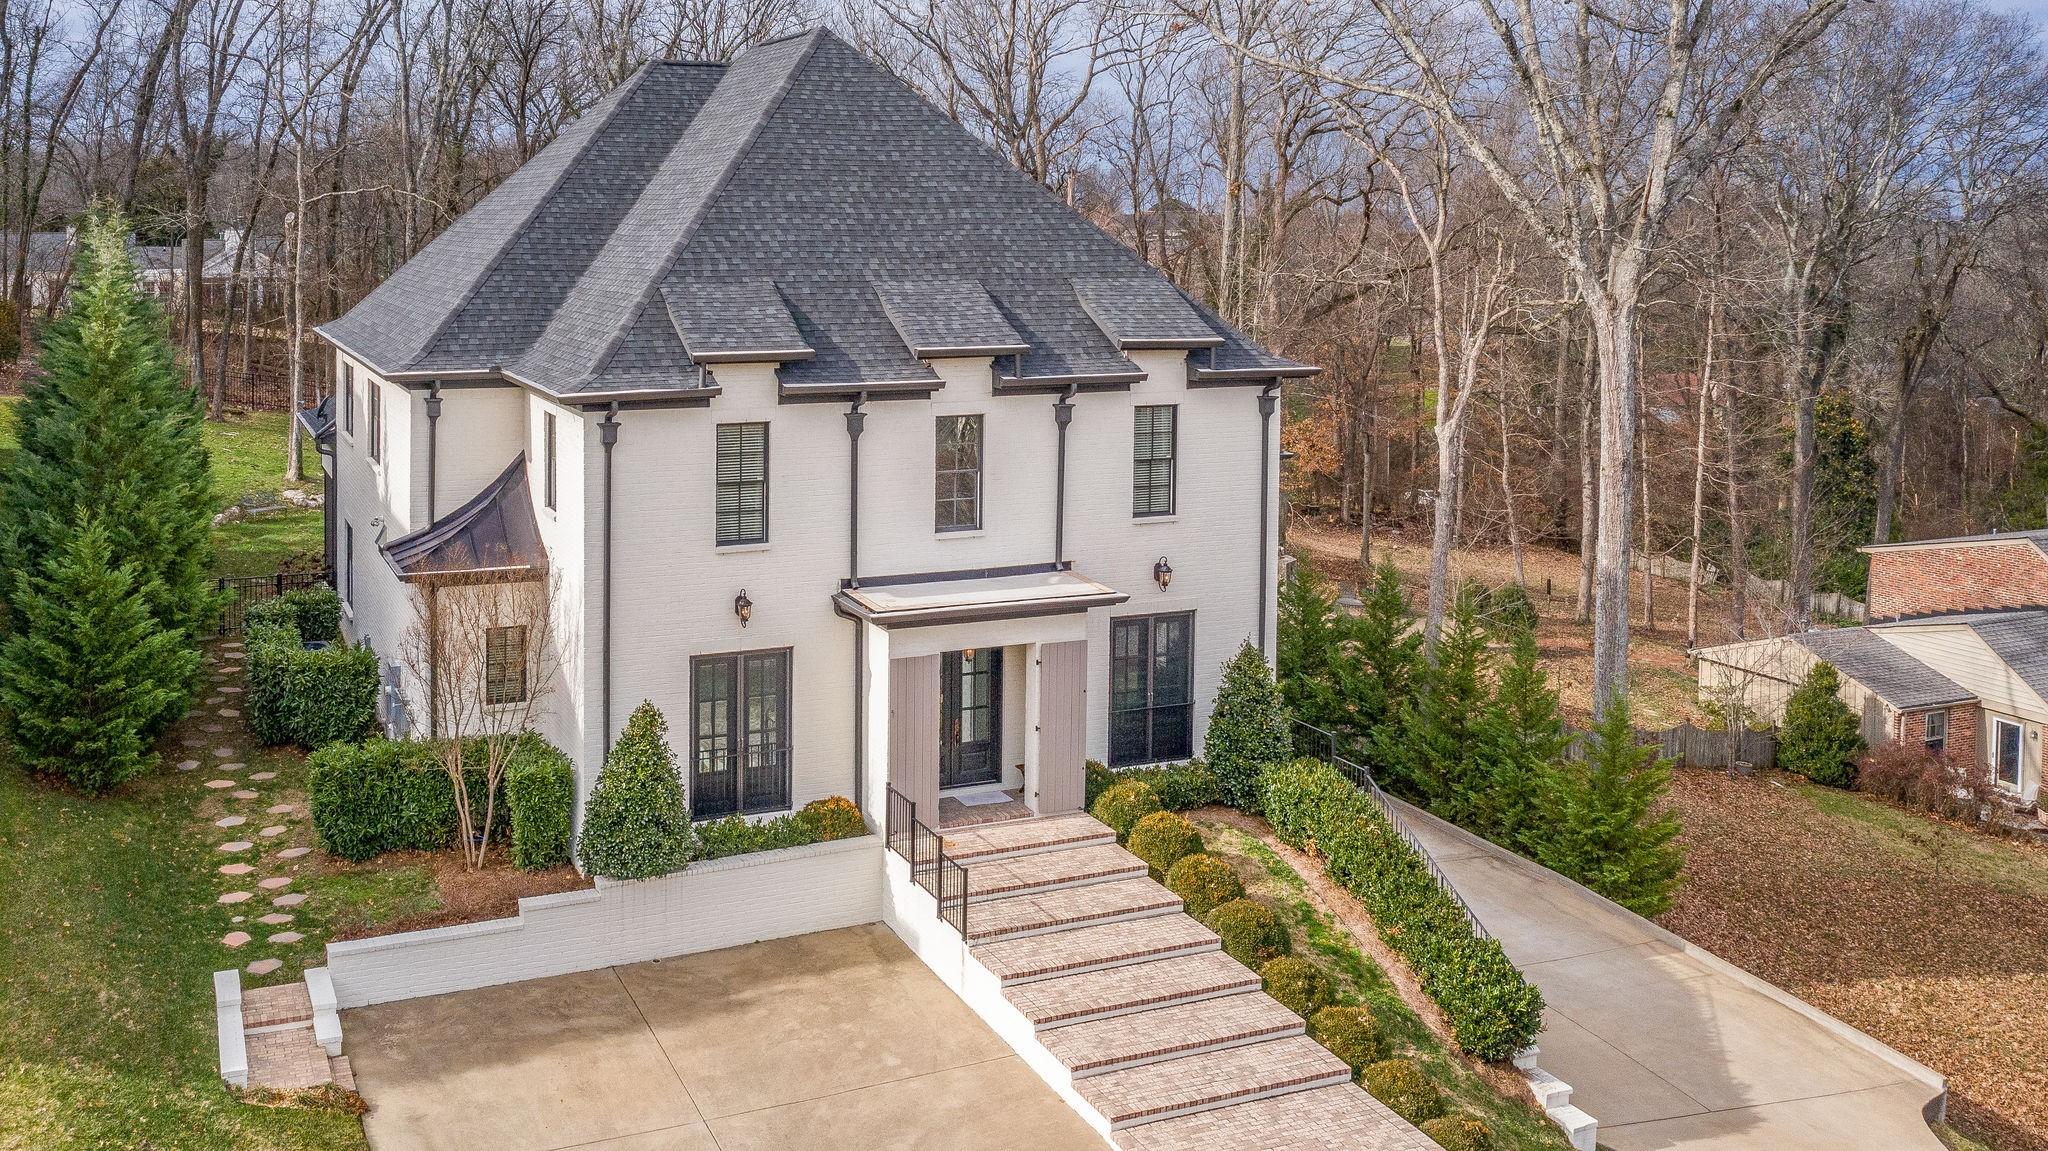 4309A Sneed Road, Nashville, TN 37215 - Nashville, TN real estate listing